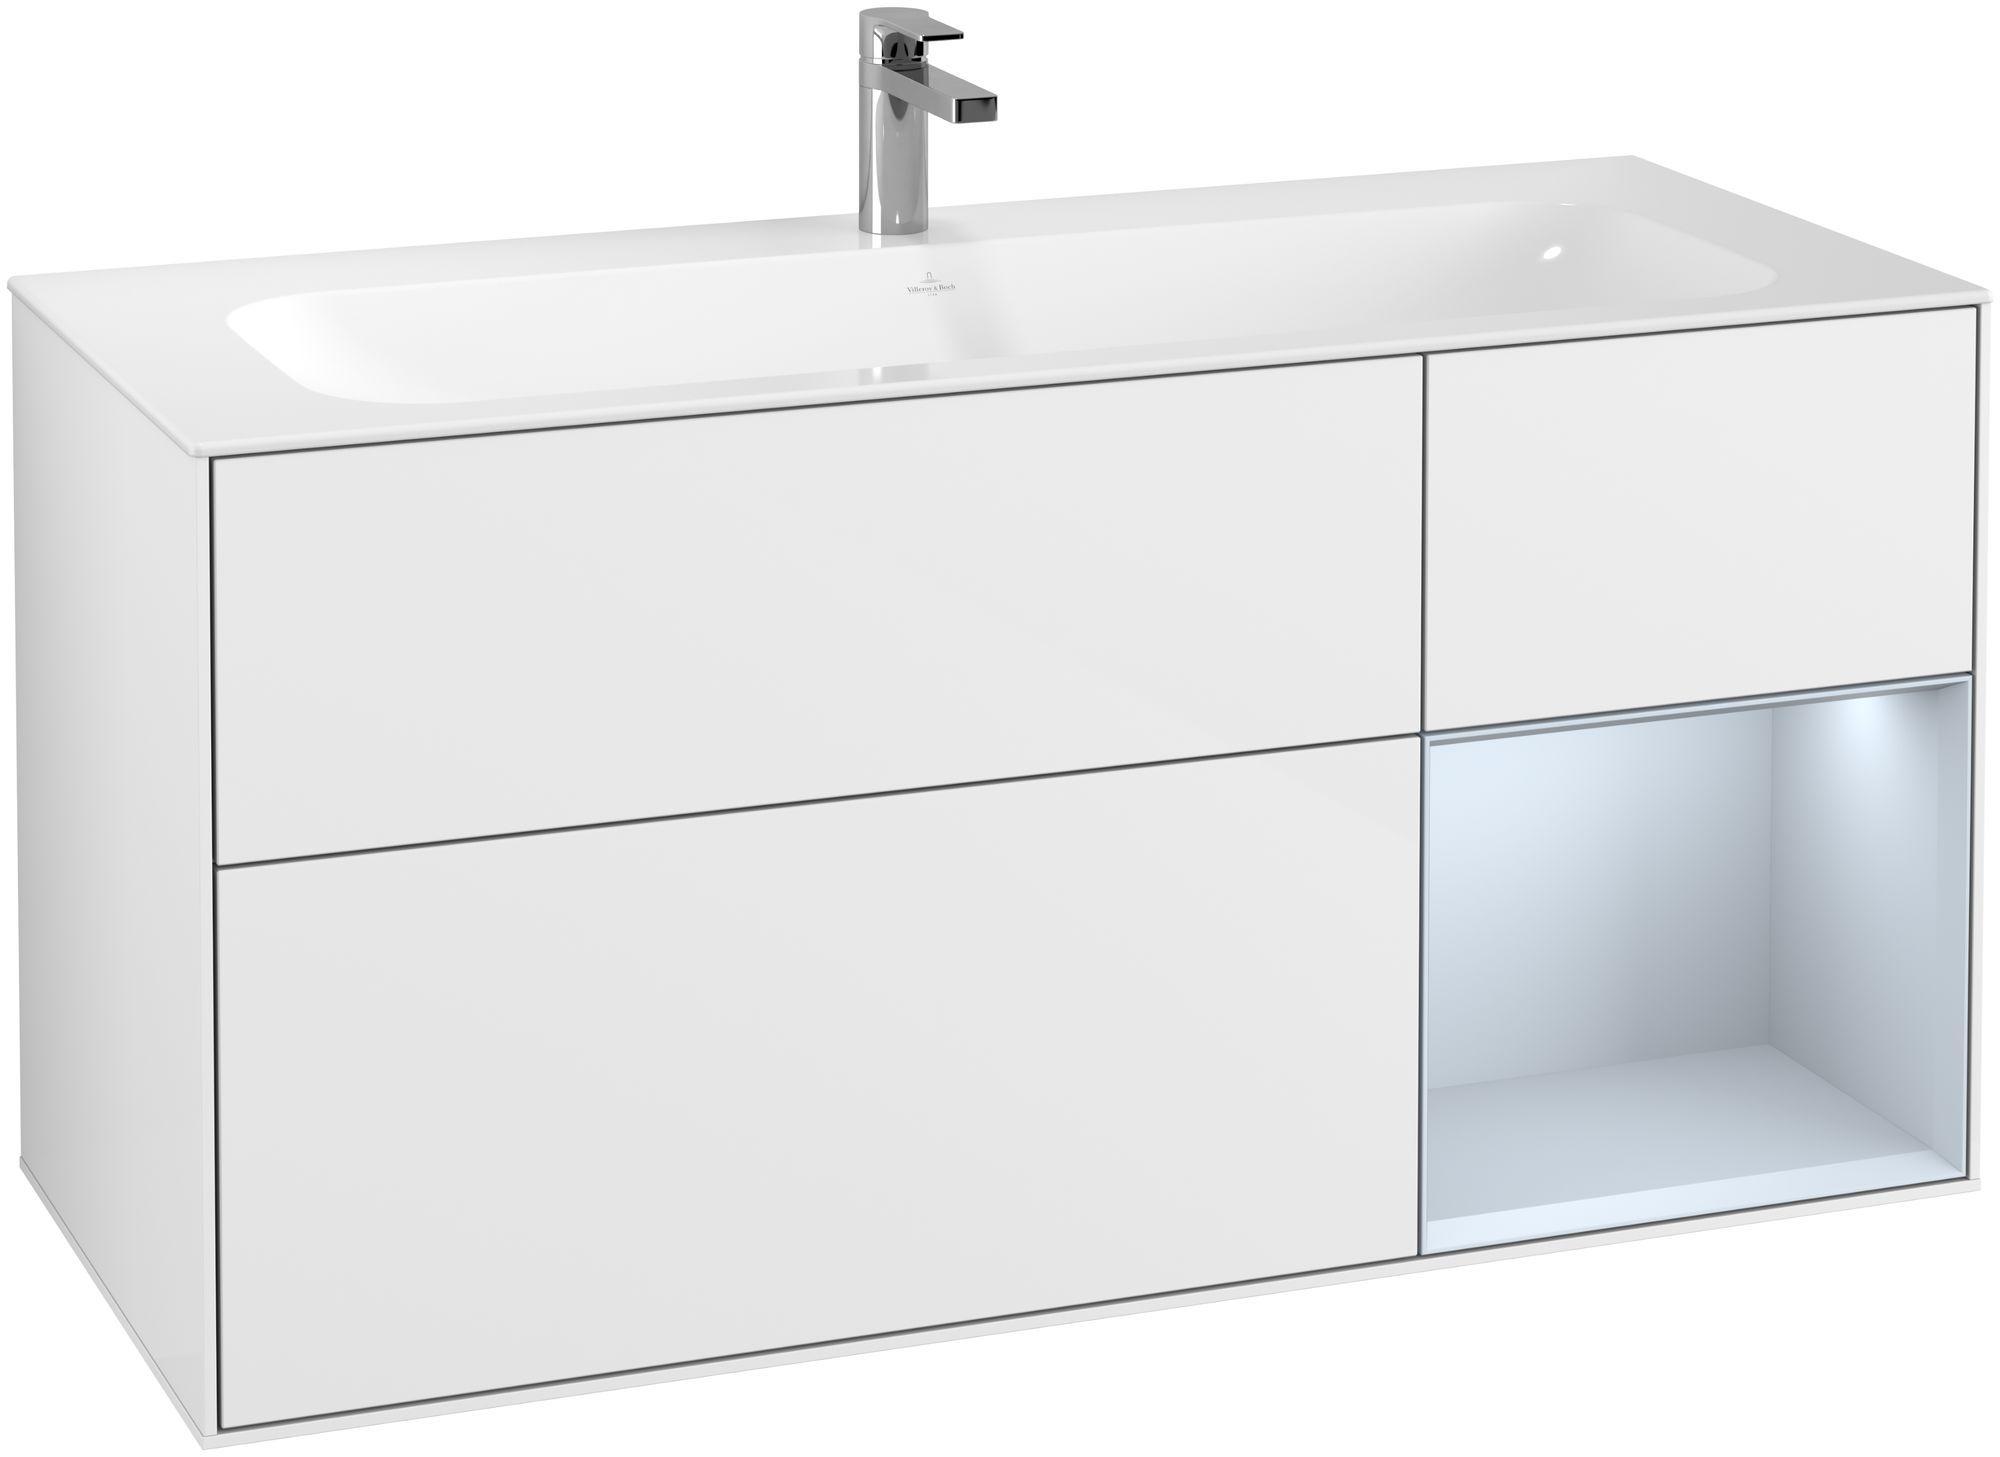 Villeroy & Boch Finion F07 Waschtischunterschrank mit Regalelement 3 Auszüge LED-Beleuchtung B:119,6xH:59,1xT:49,8cm Front, Korpus: Glossy White Lack, Regal: Cloud F070HAGF